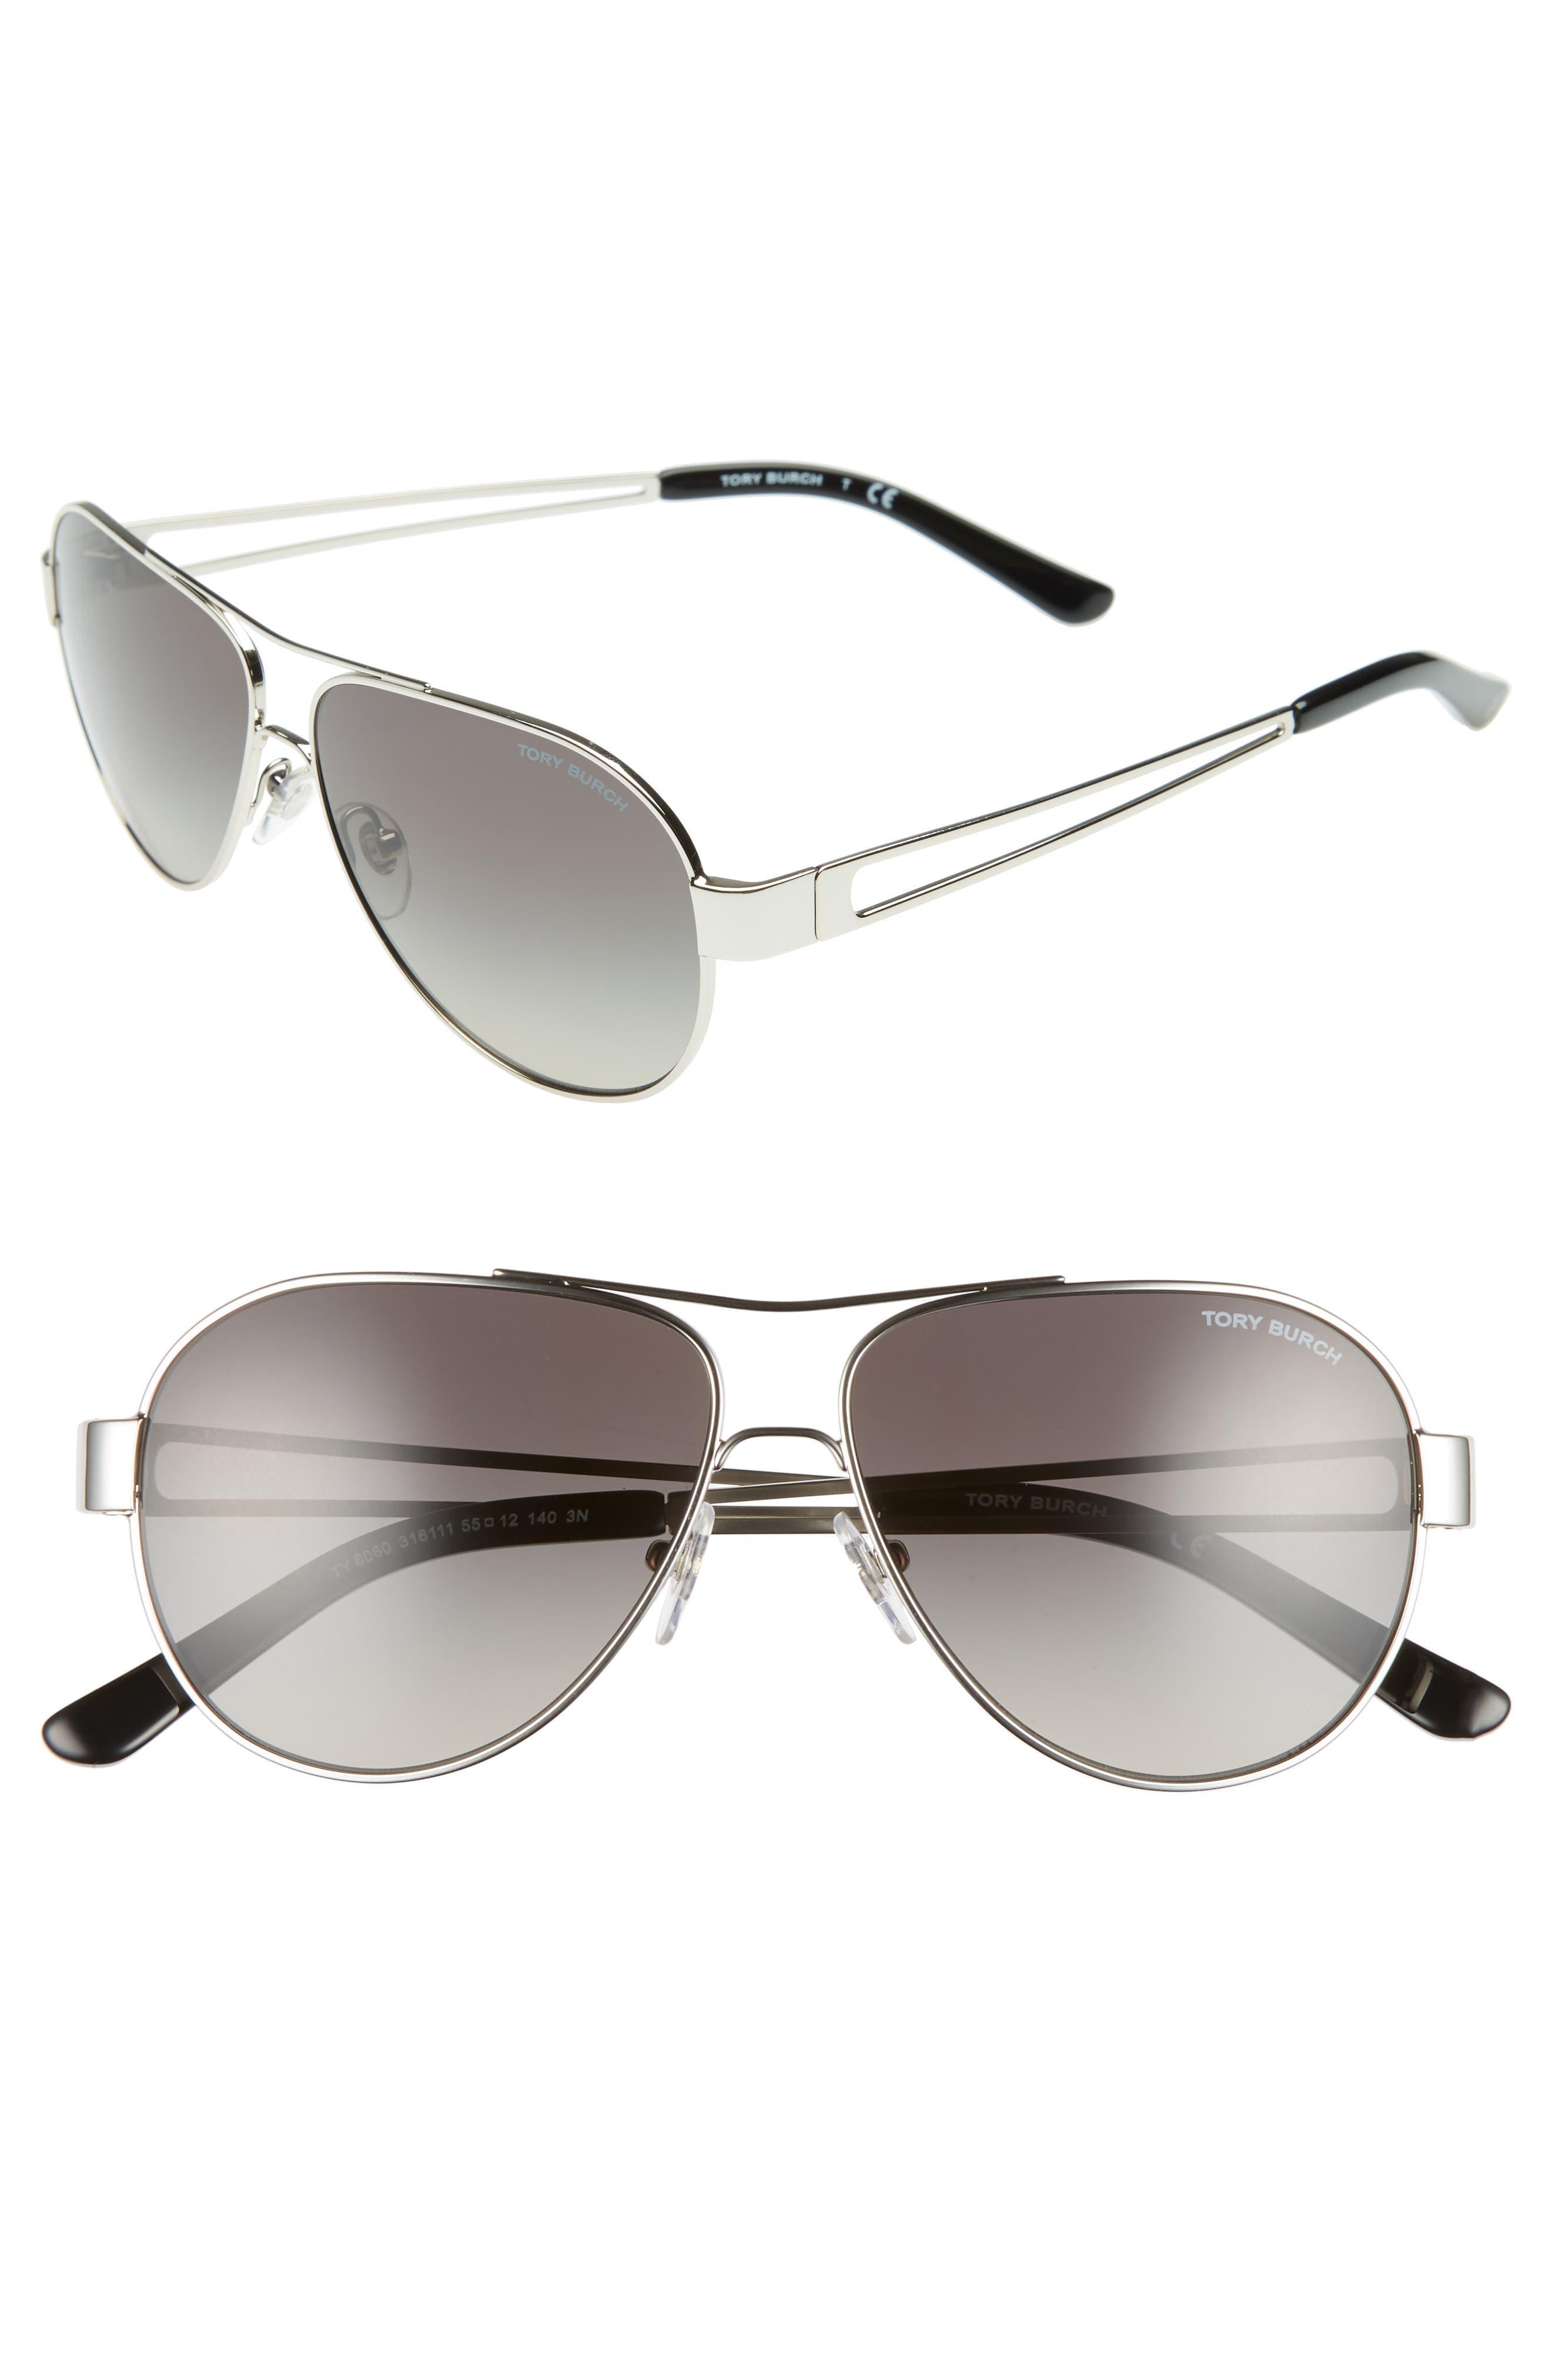 TORY BURCH 55mm Polarized Aviator Sunglasses, Main, color, SILVER/ BLACK GRADIENT